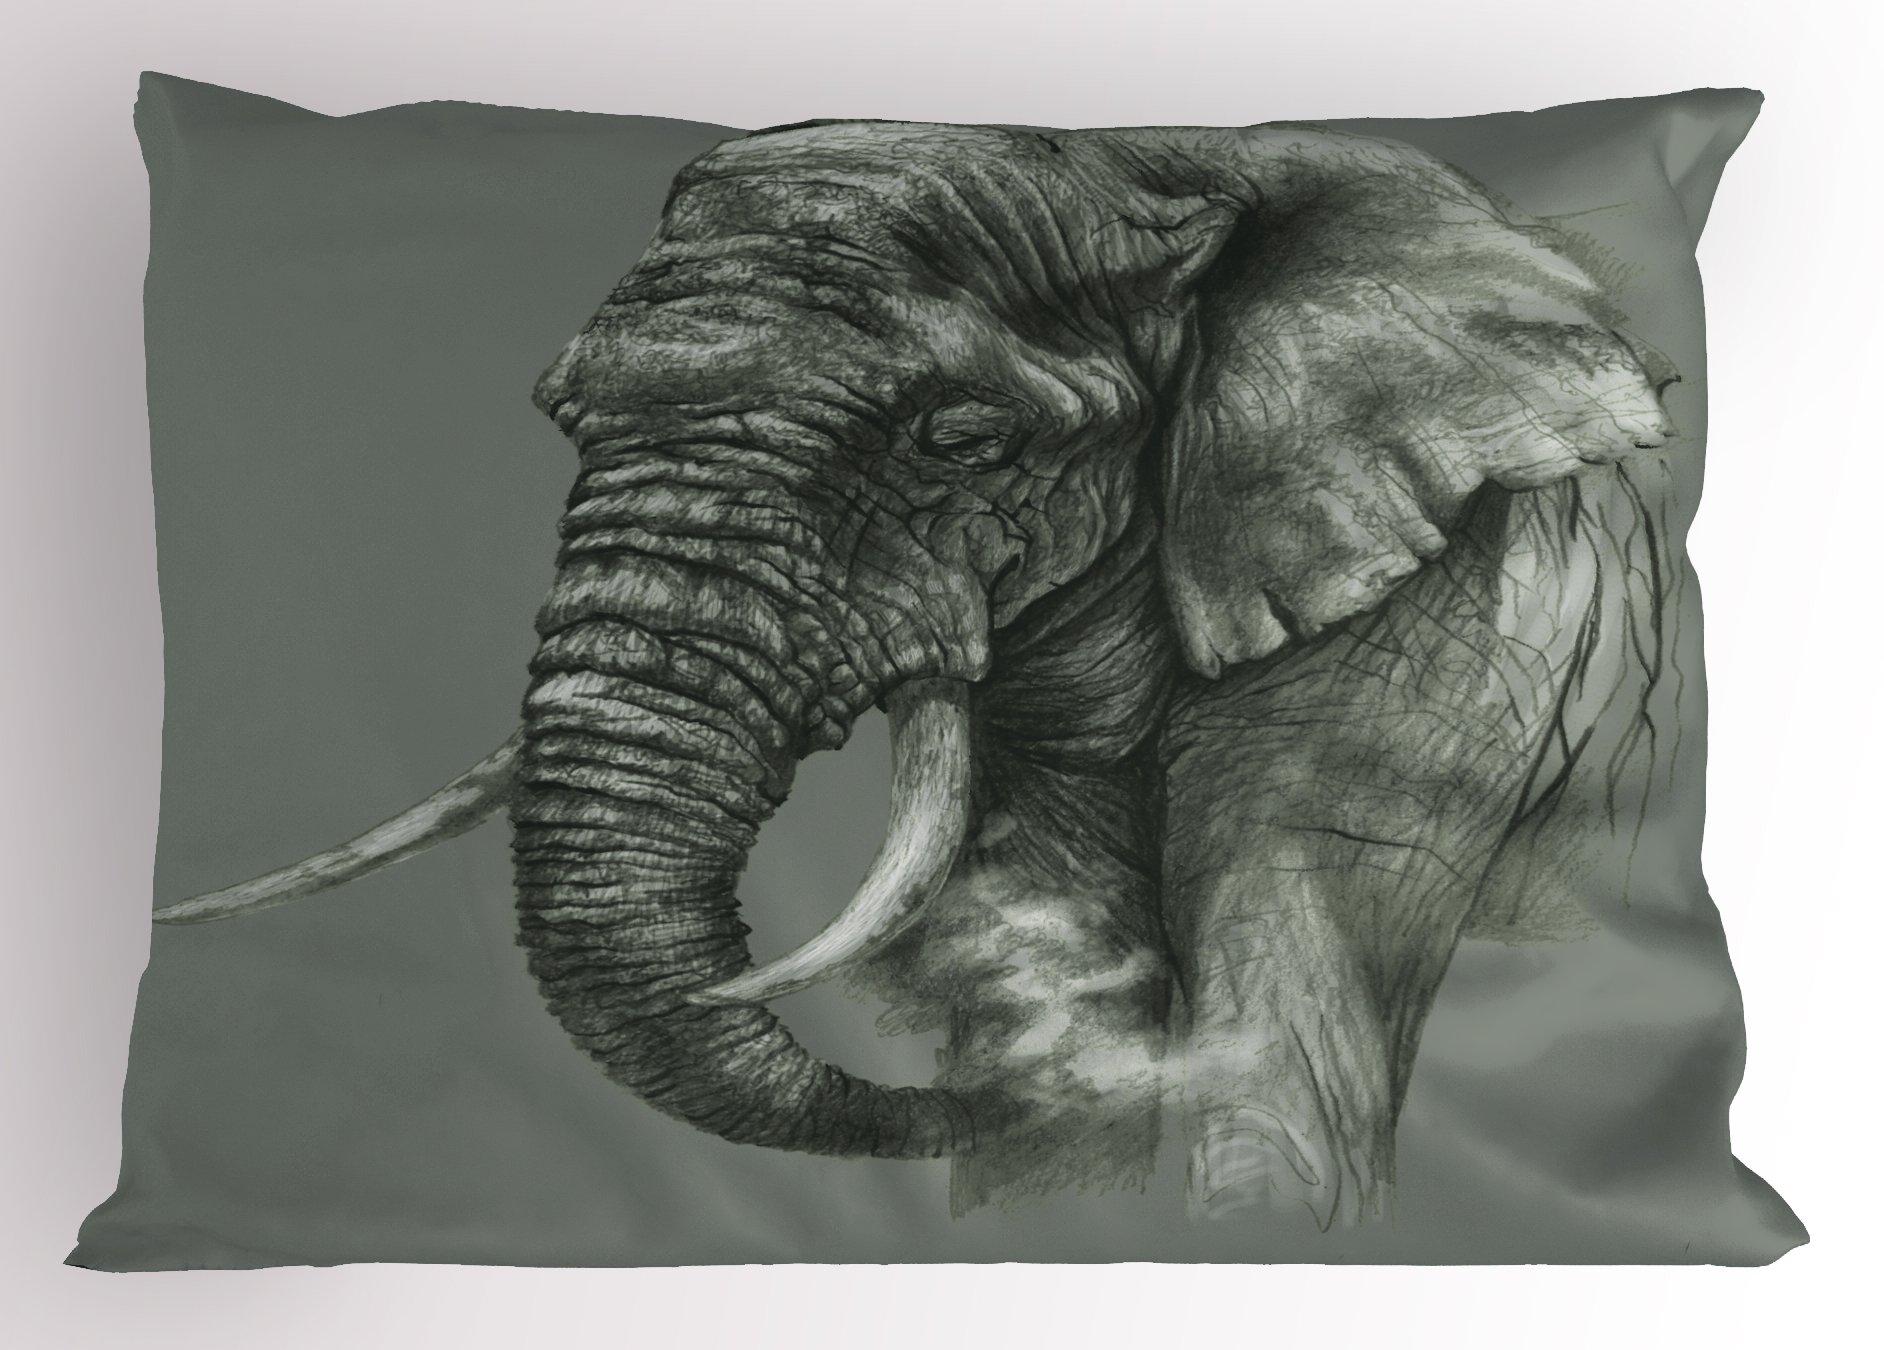 Lunarable Animal Pillow Sham, Rough Sketch Portrait of African Elephant Safari Spiritual Mammal Artsy Picture Print, Decorative Standard Queen Size Printed Pillowcase, 30 X 20 inches, Dark Grey